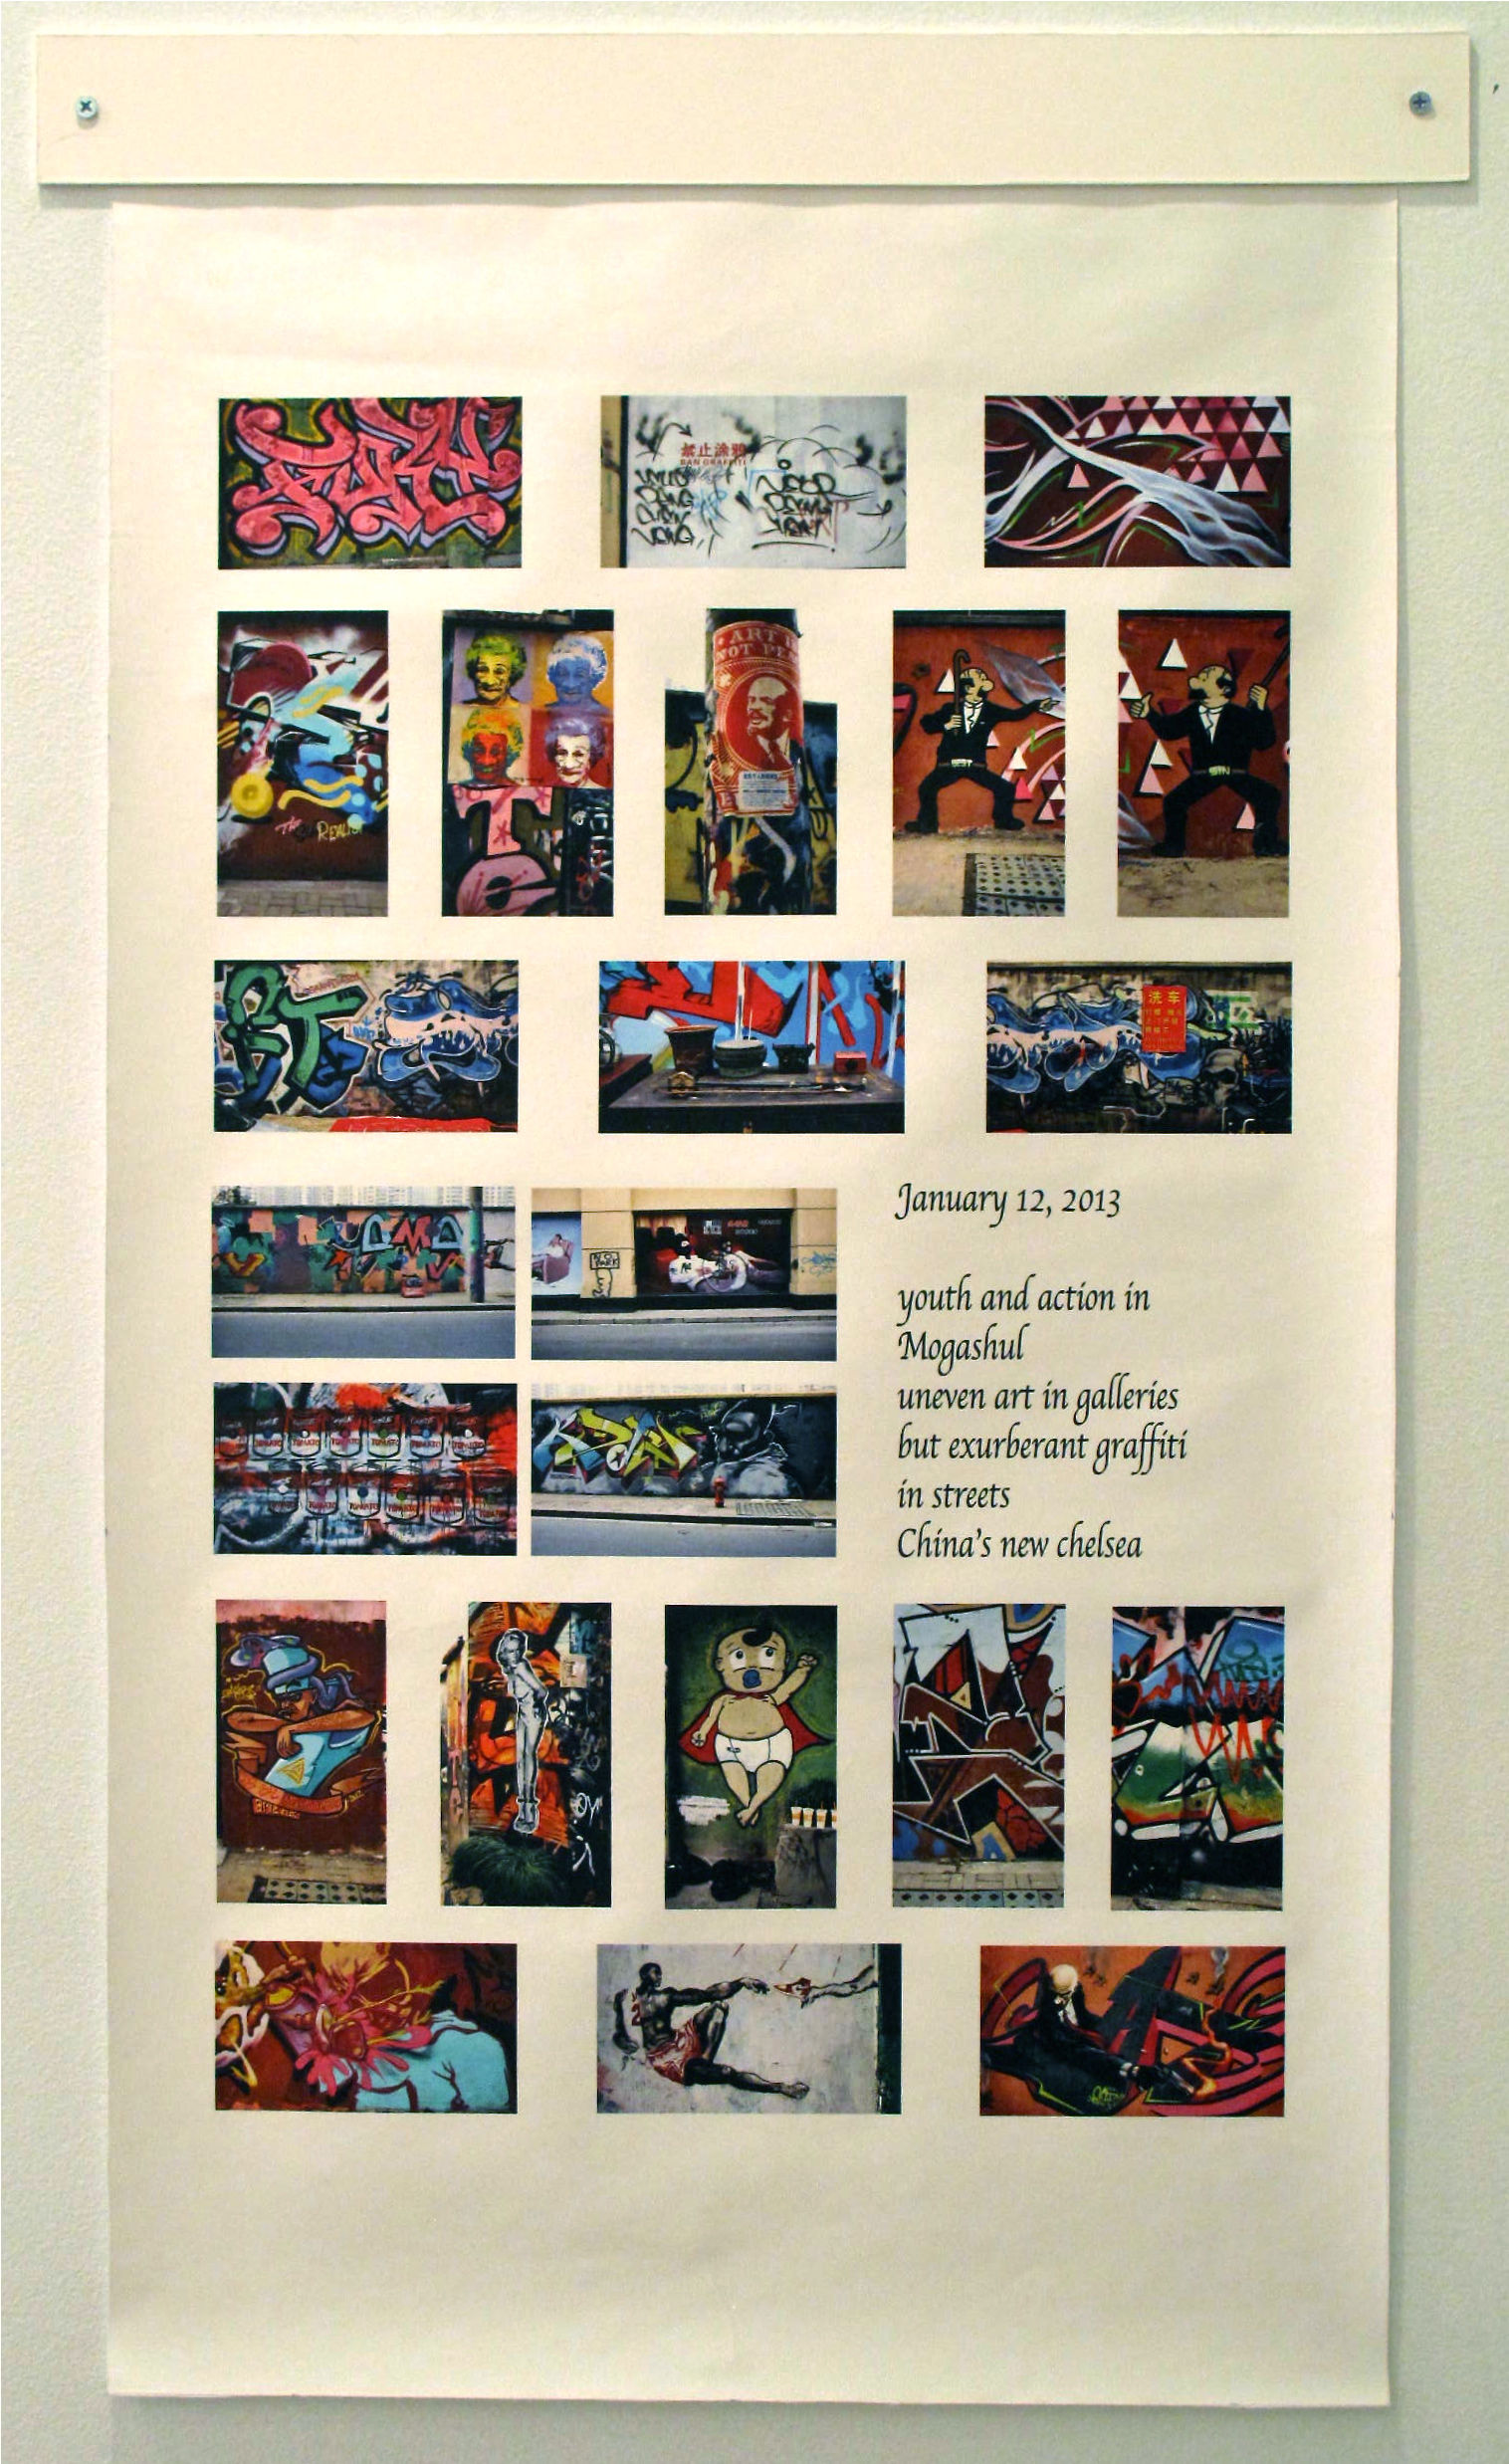 Sara Petitt, On the Wall, scroll 12